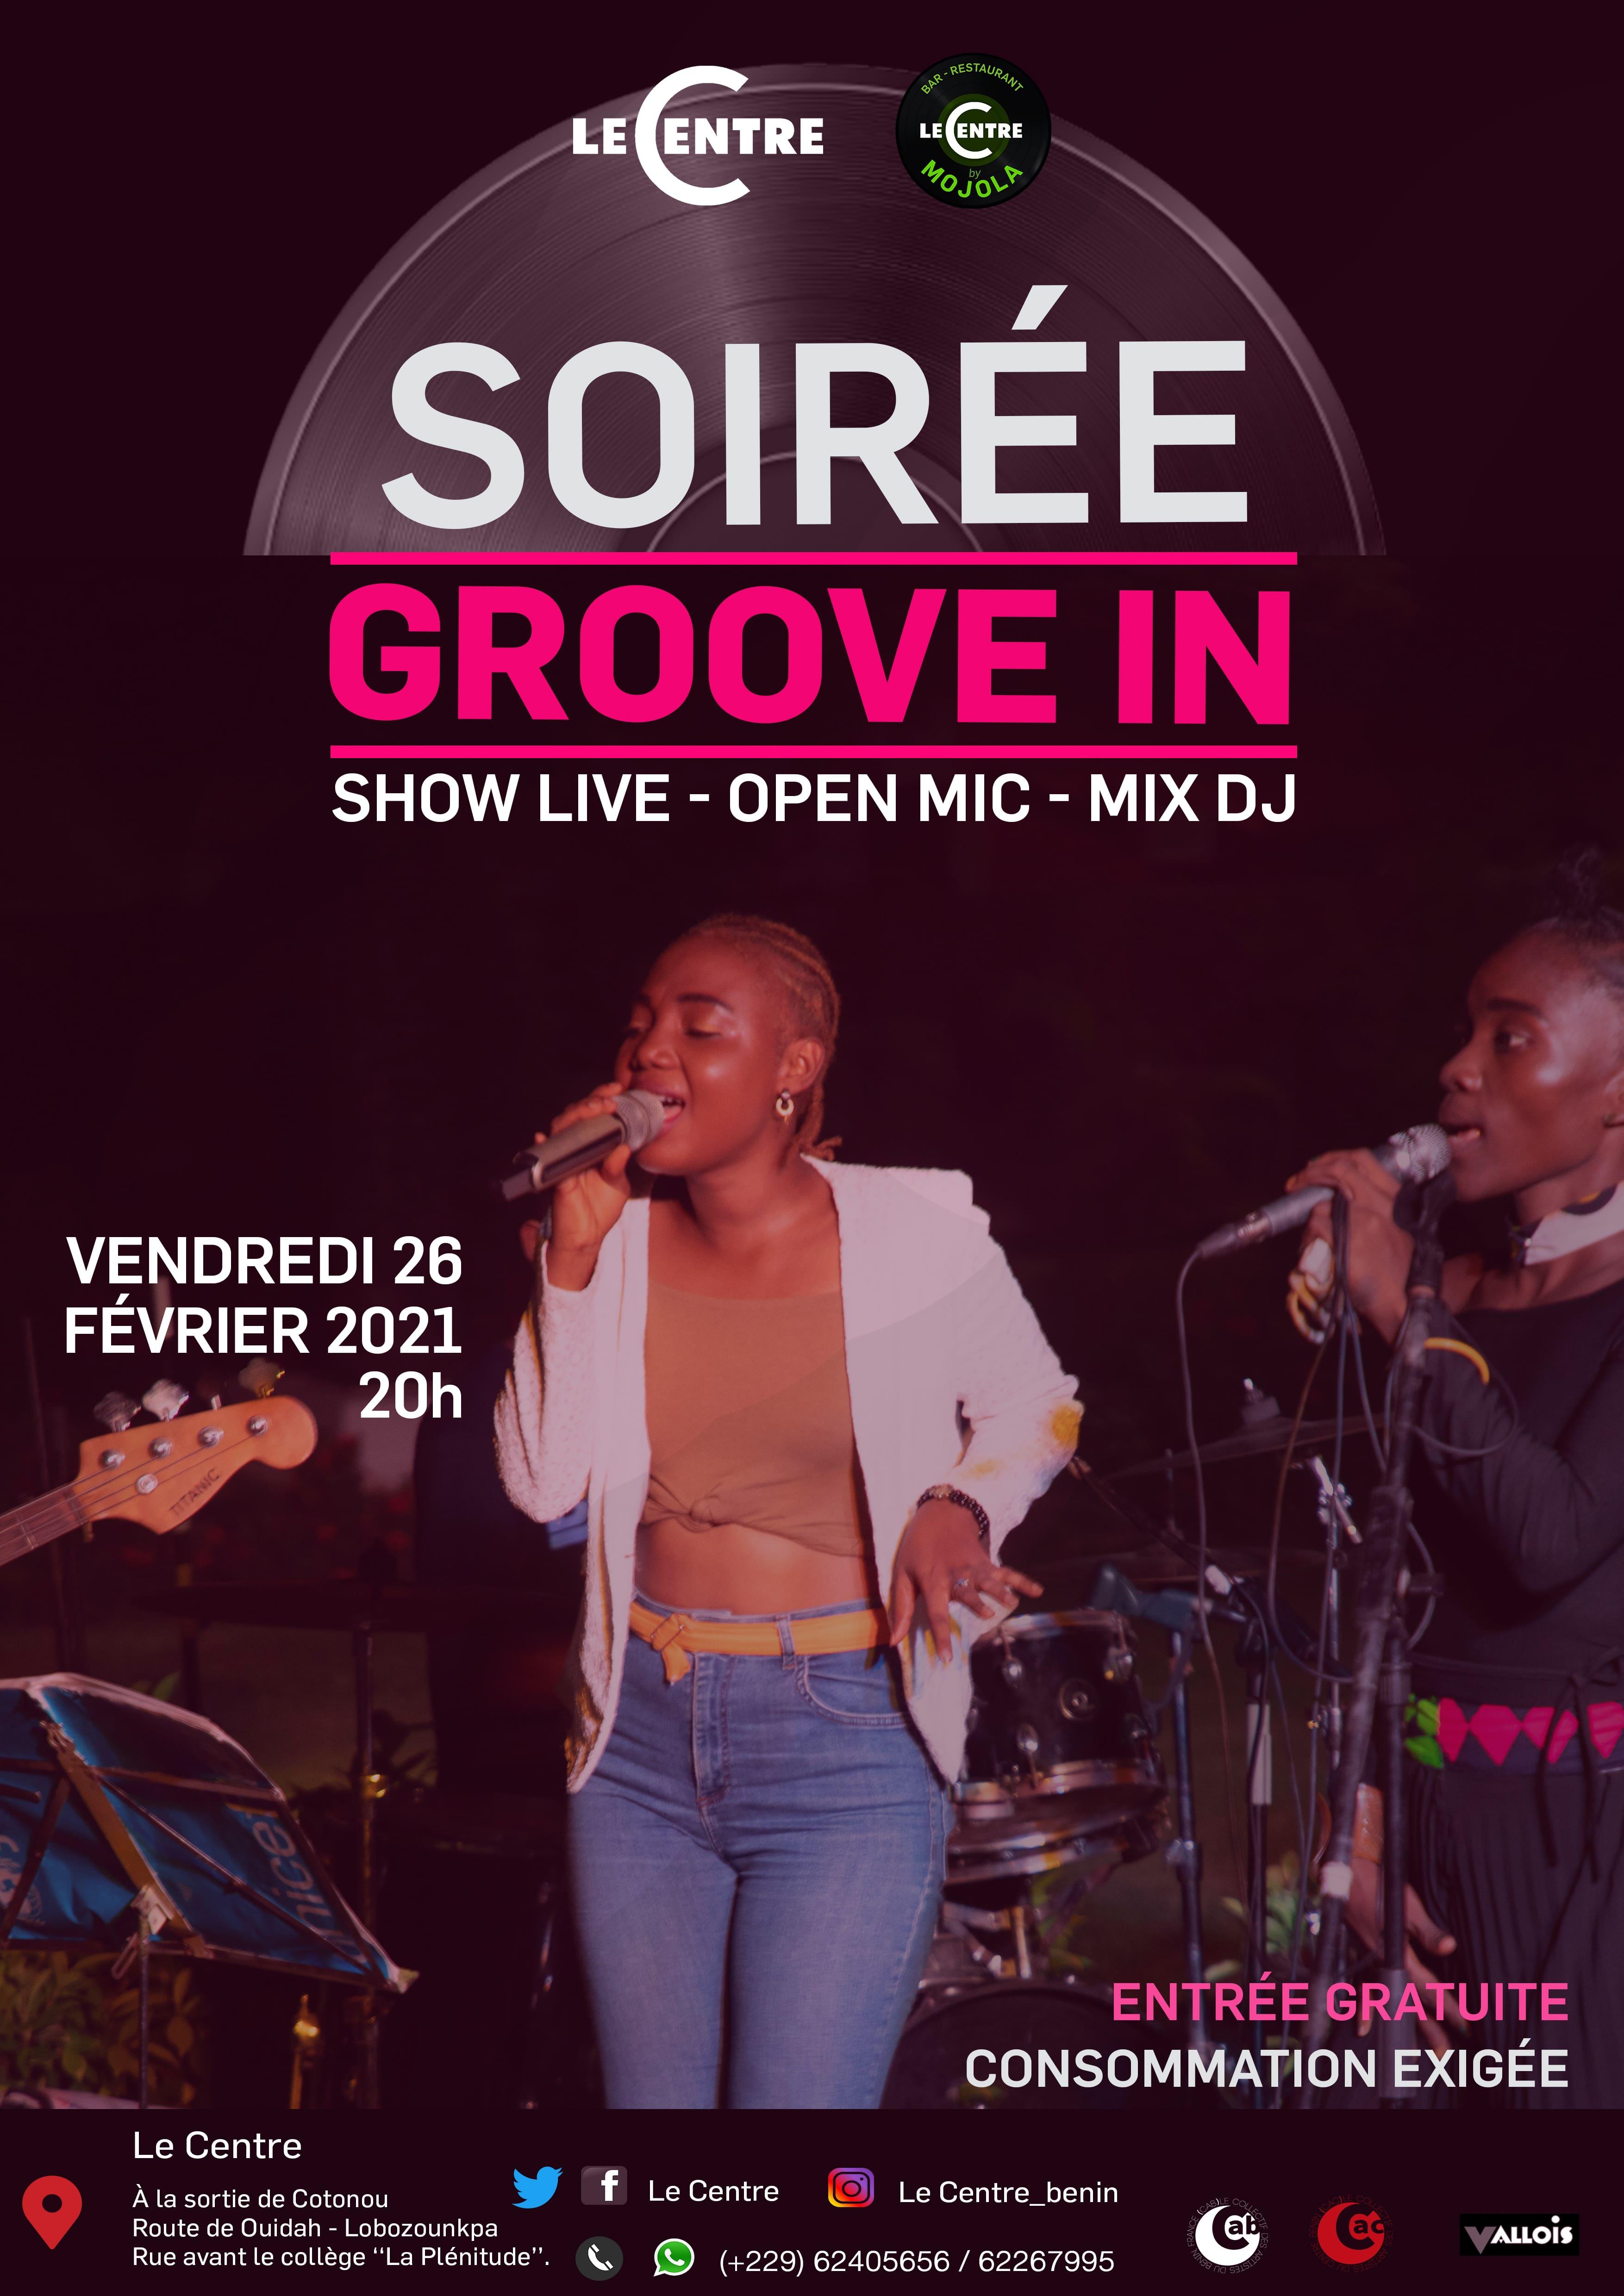 Le Centre By Mojola, Soirée Groove in